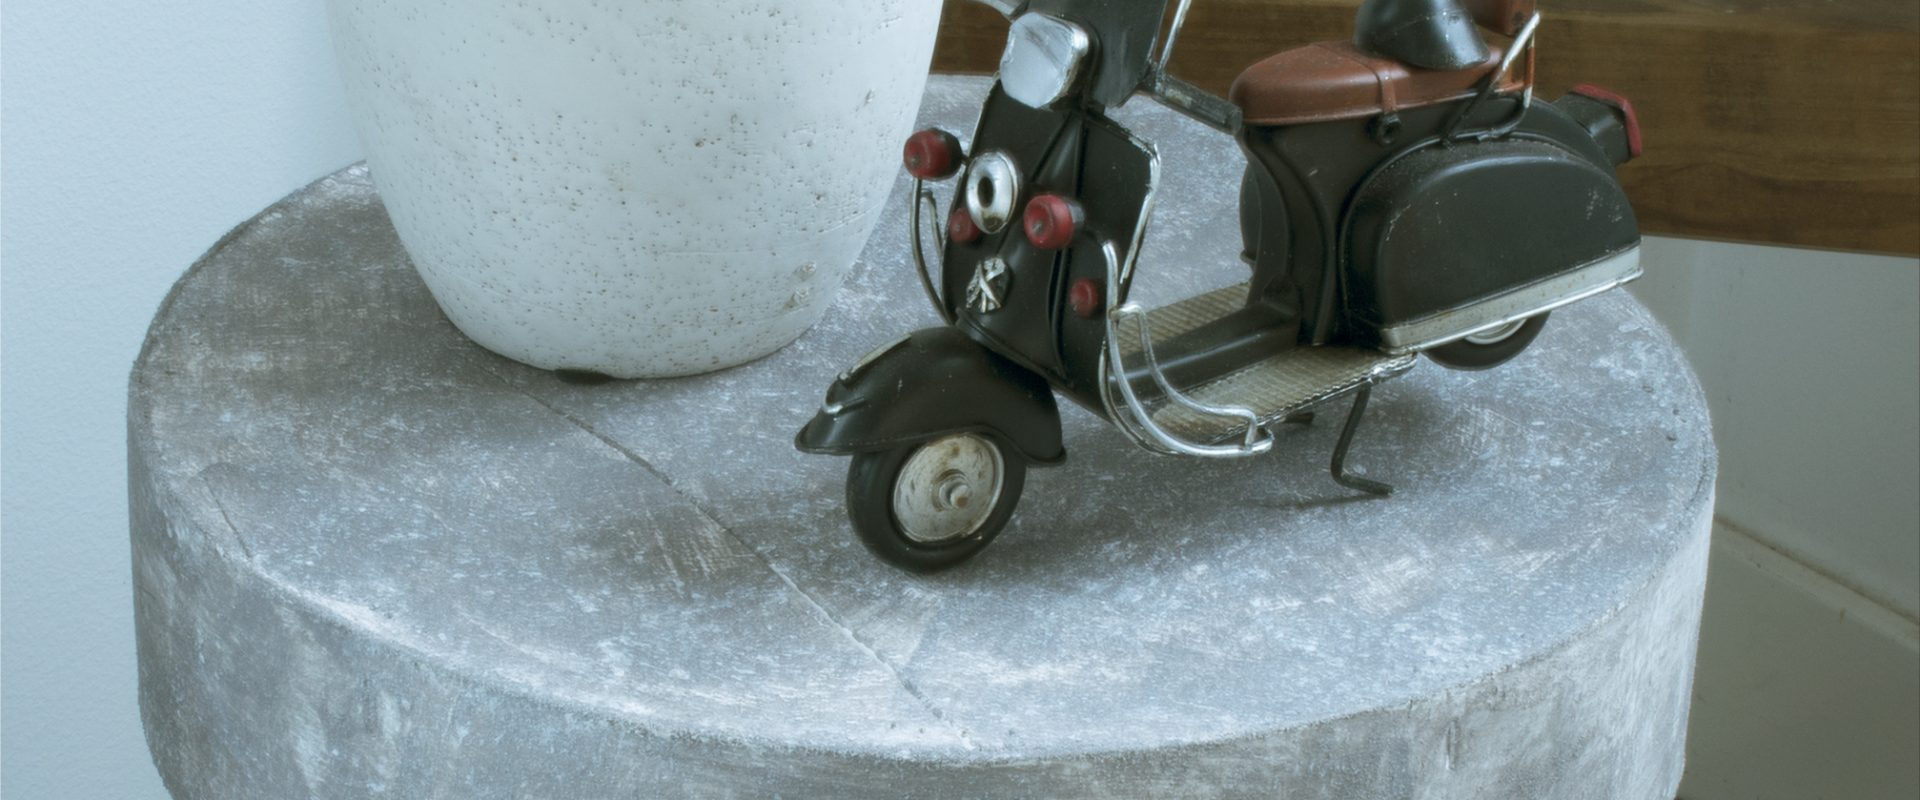 DIY-Betonlook-verf-betonlook-krukje-betonlook-effect-betonlook-muur-betonlook-vloer-verf-betonlook-muurverf-betonlook-betonlook-op-hout-00